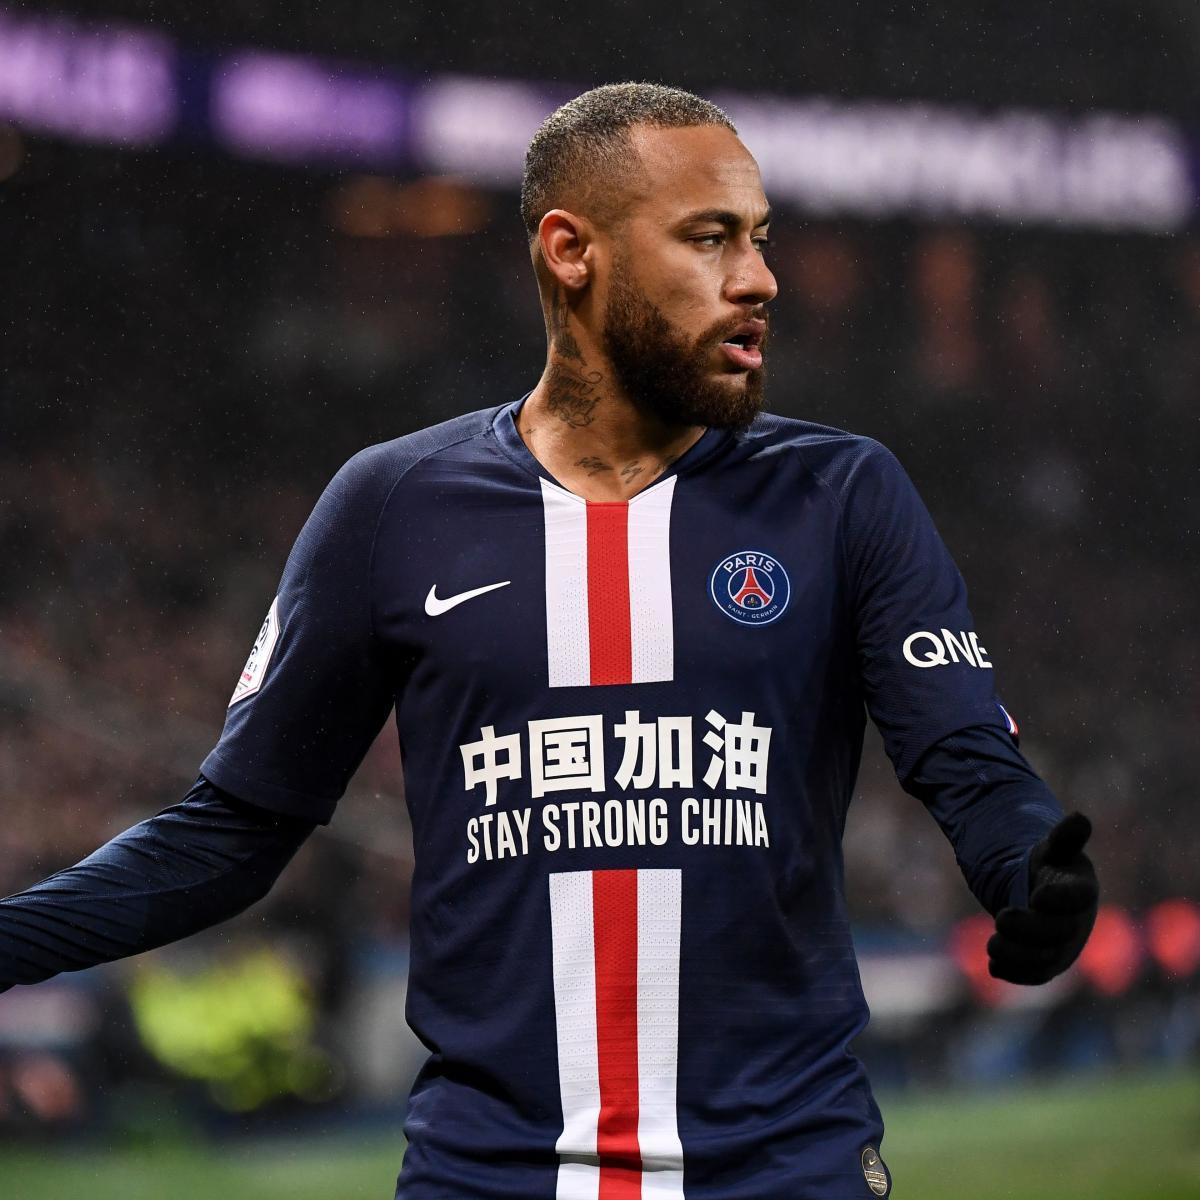 Neymar Sent Off, Edinson Cavani Scores 200th PSG Goal in Win vs. Bordeaux